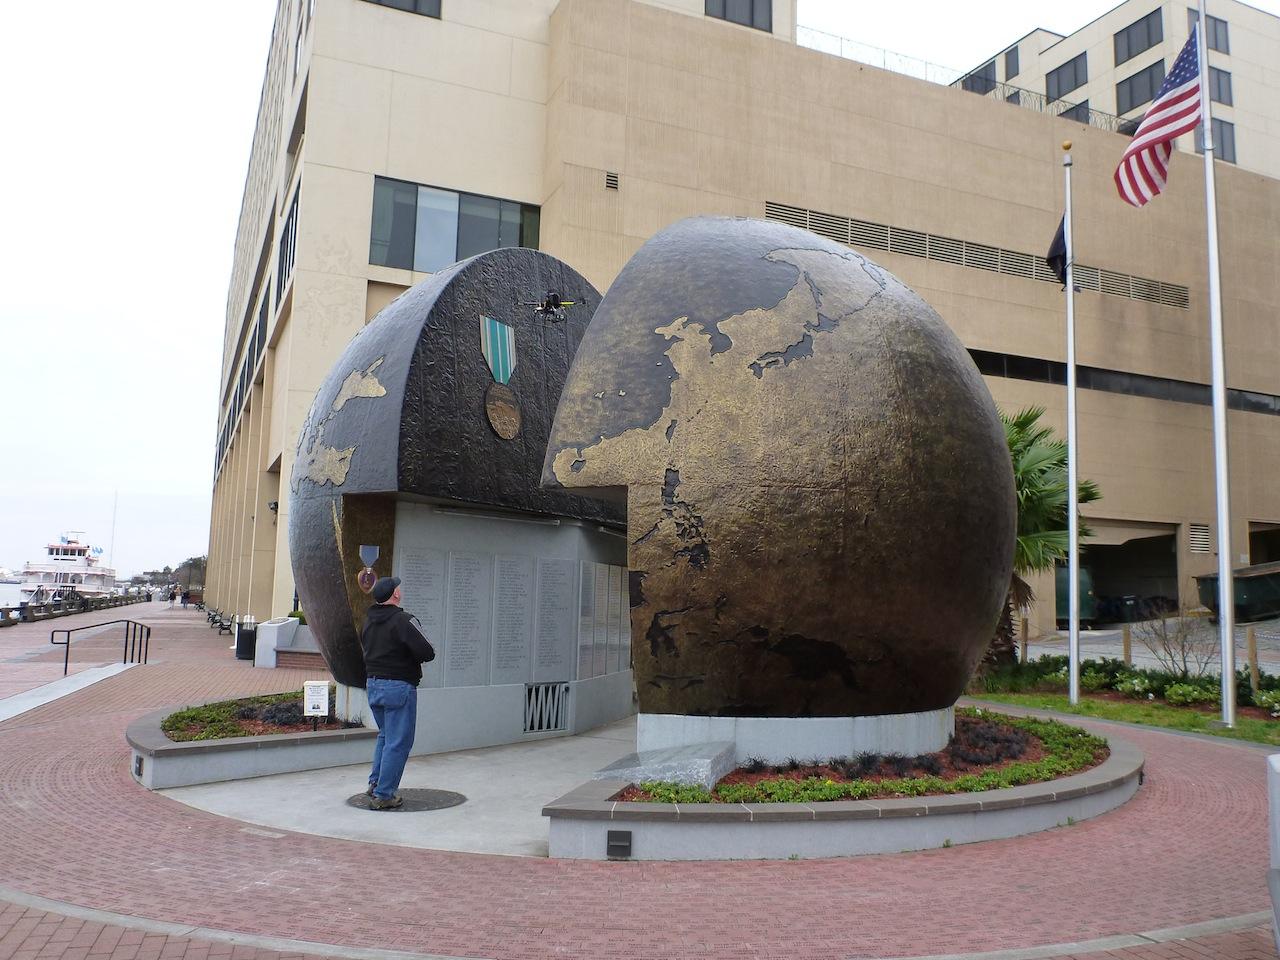 The WWII Globe Memorial